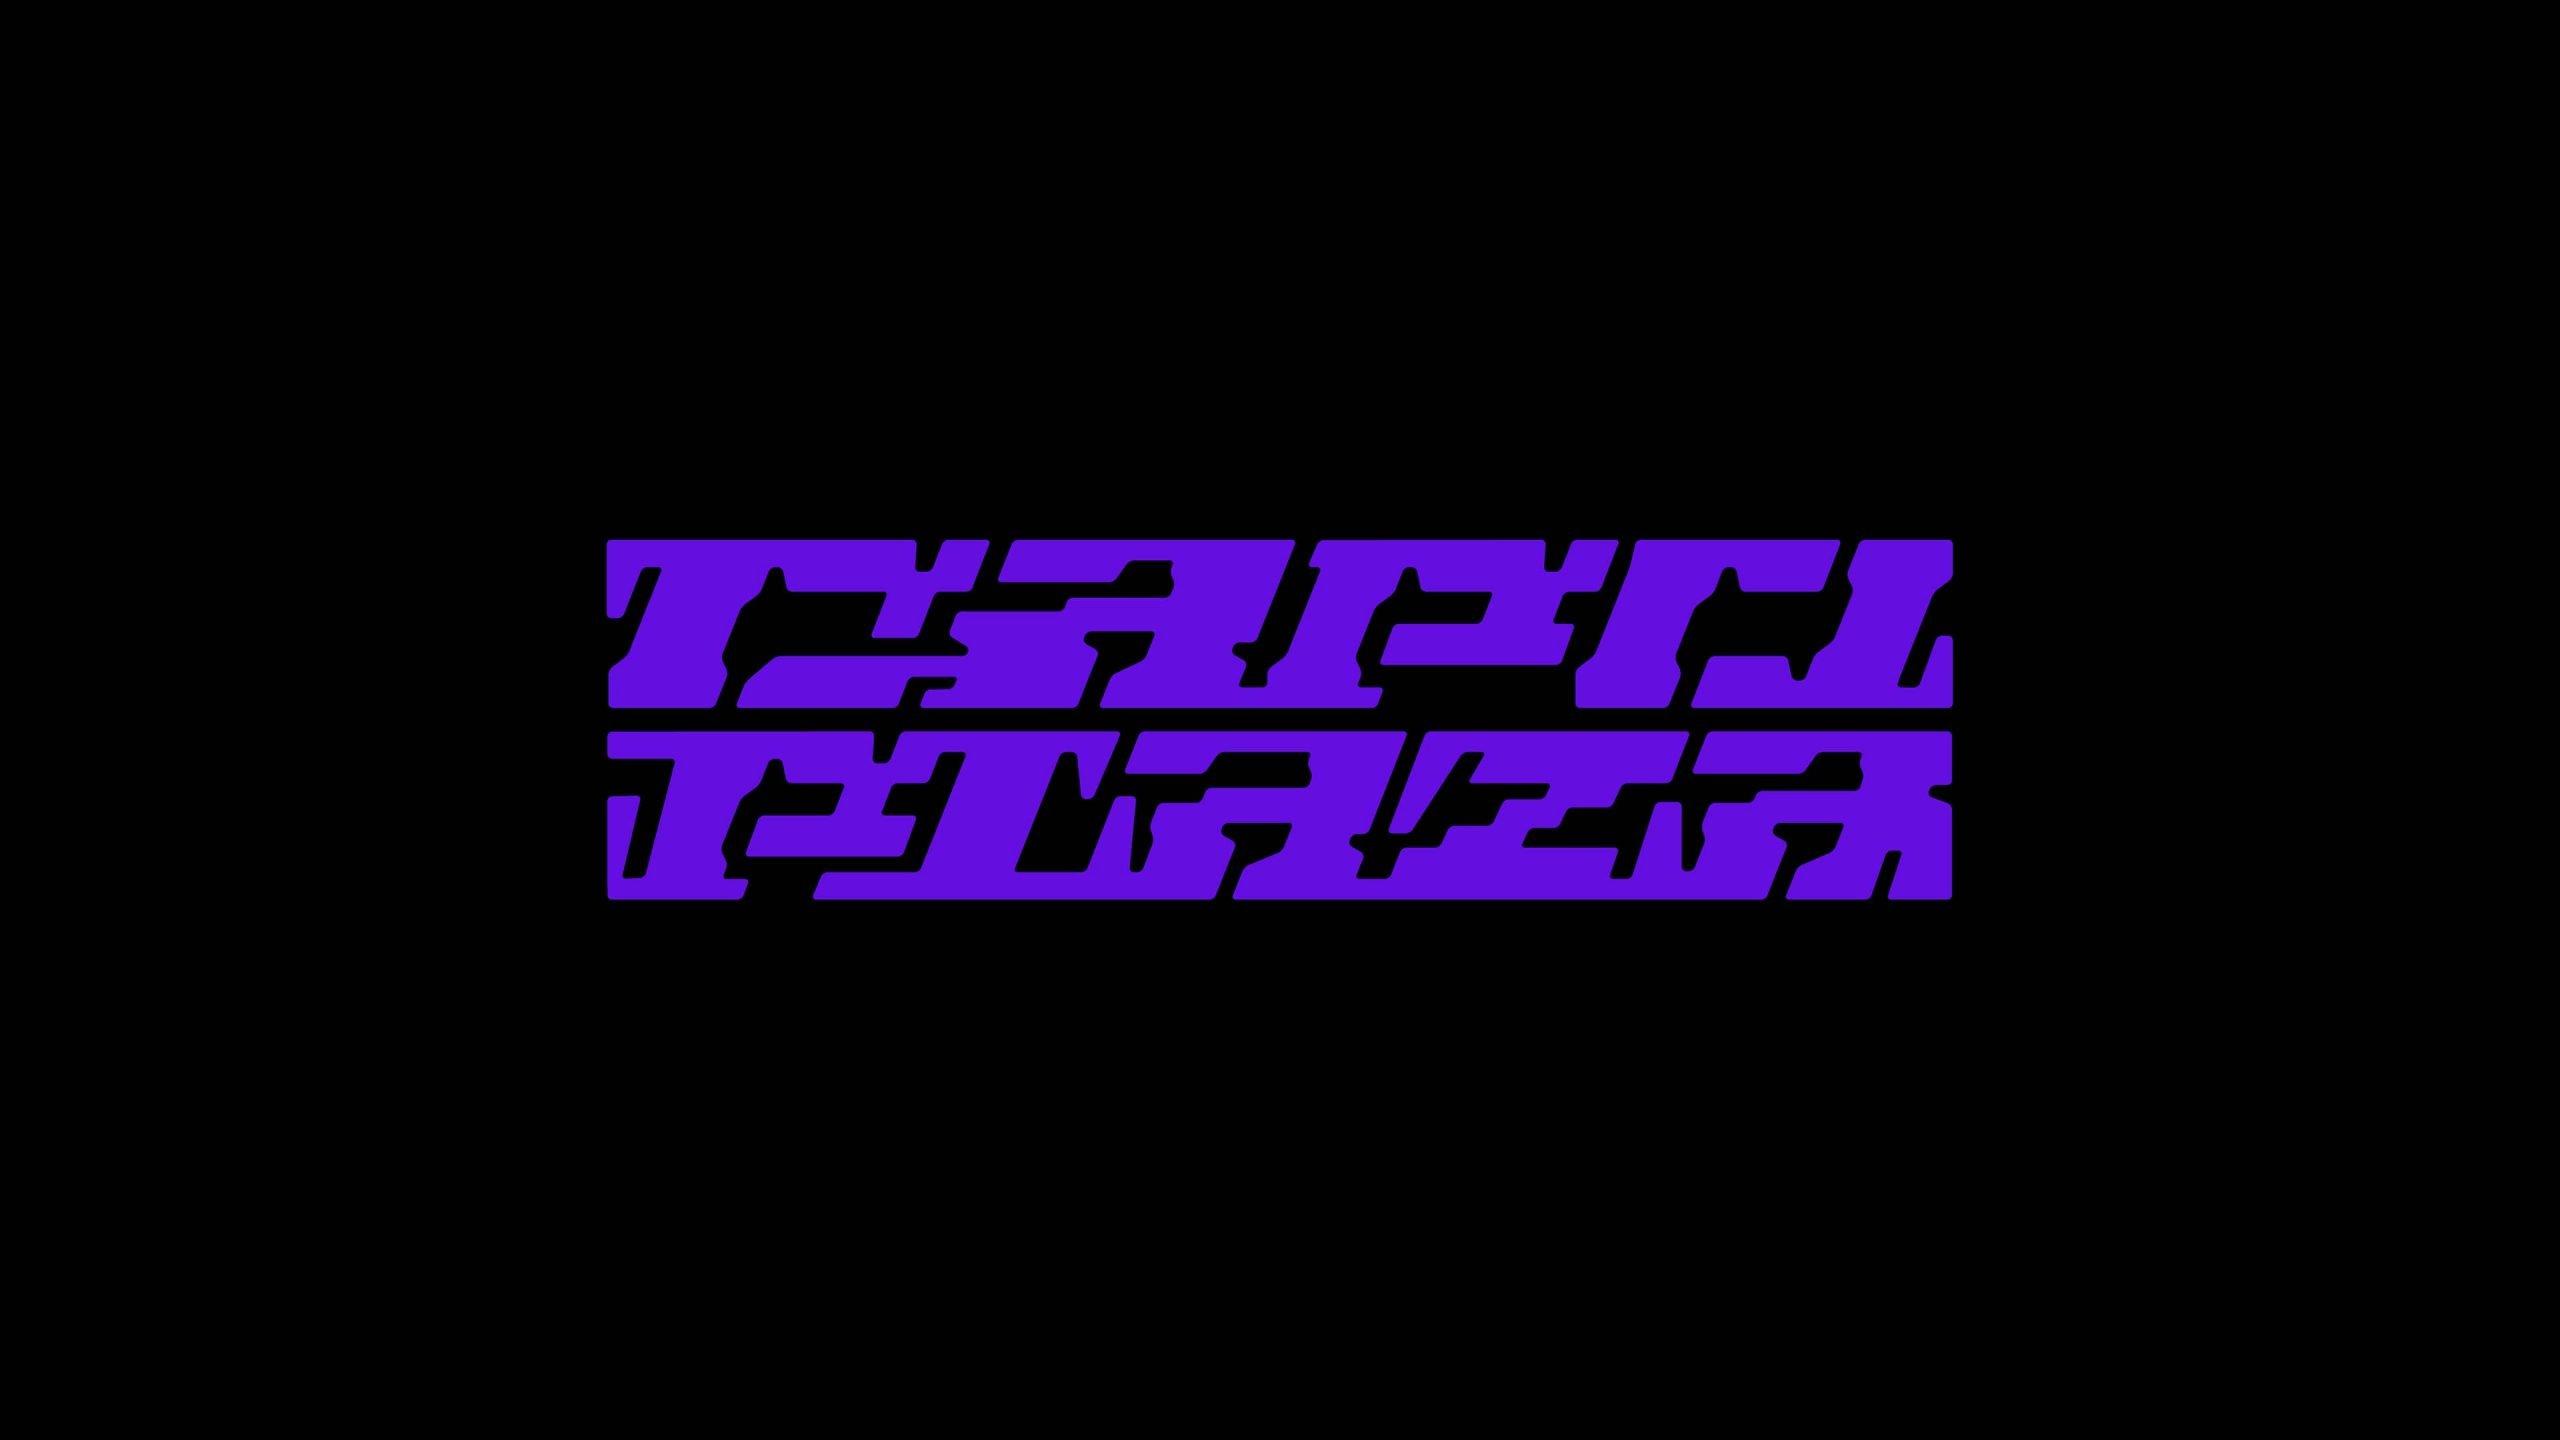 CAPO-PLAZA-TOUR-MERCH-Graphics-05